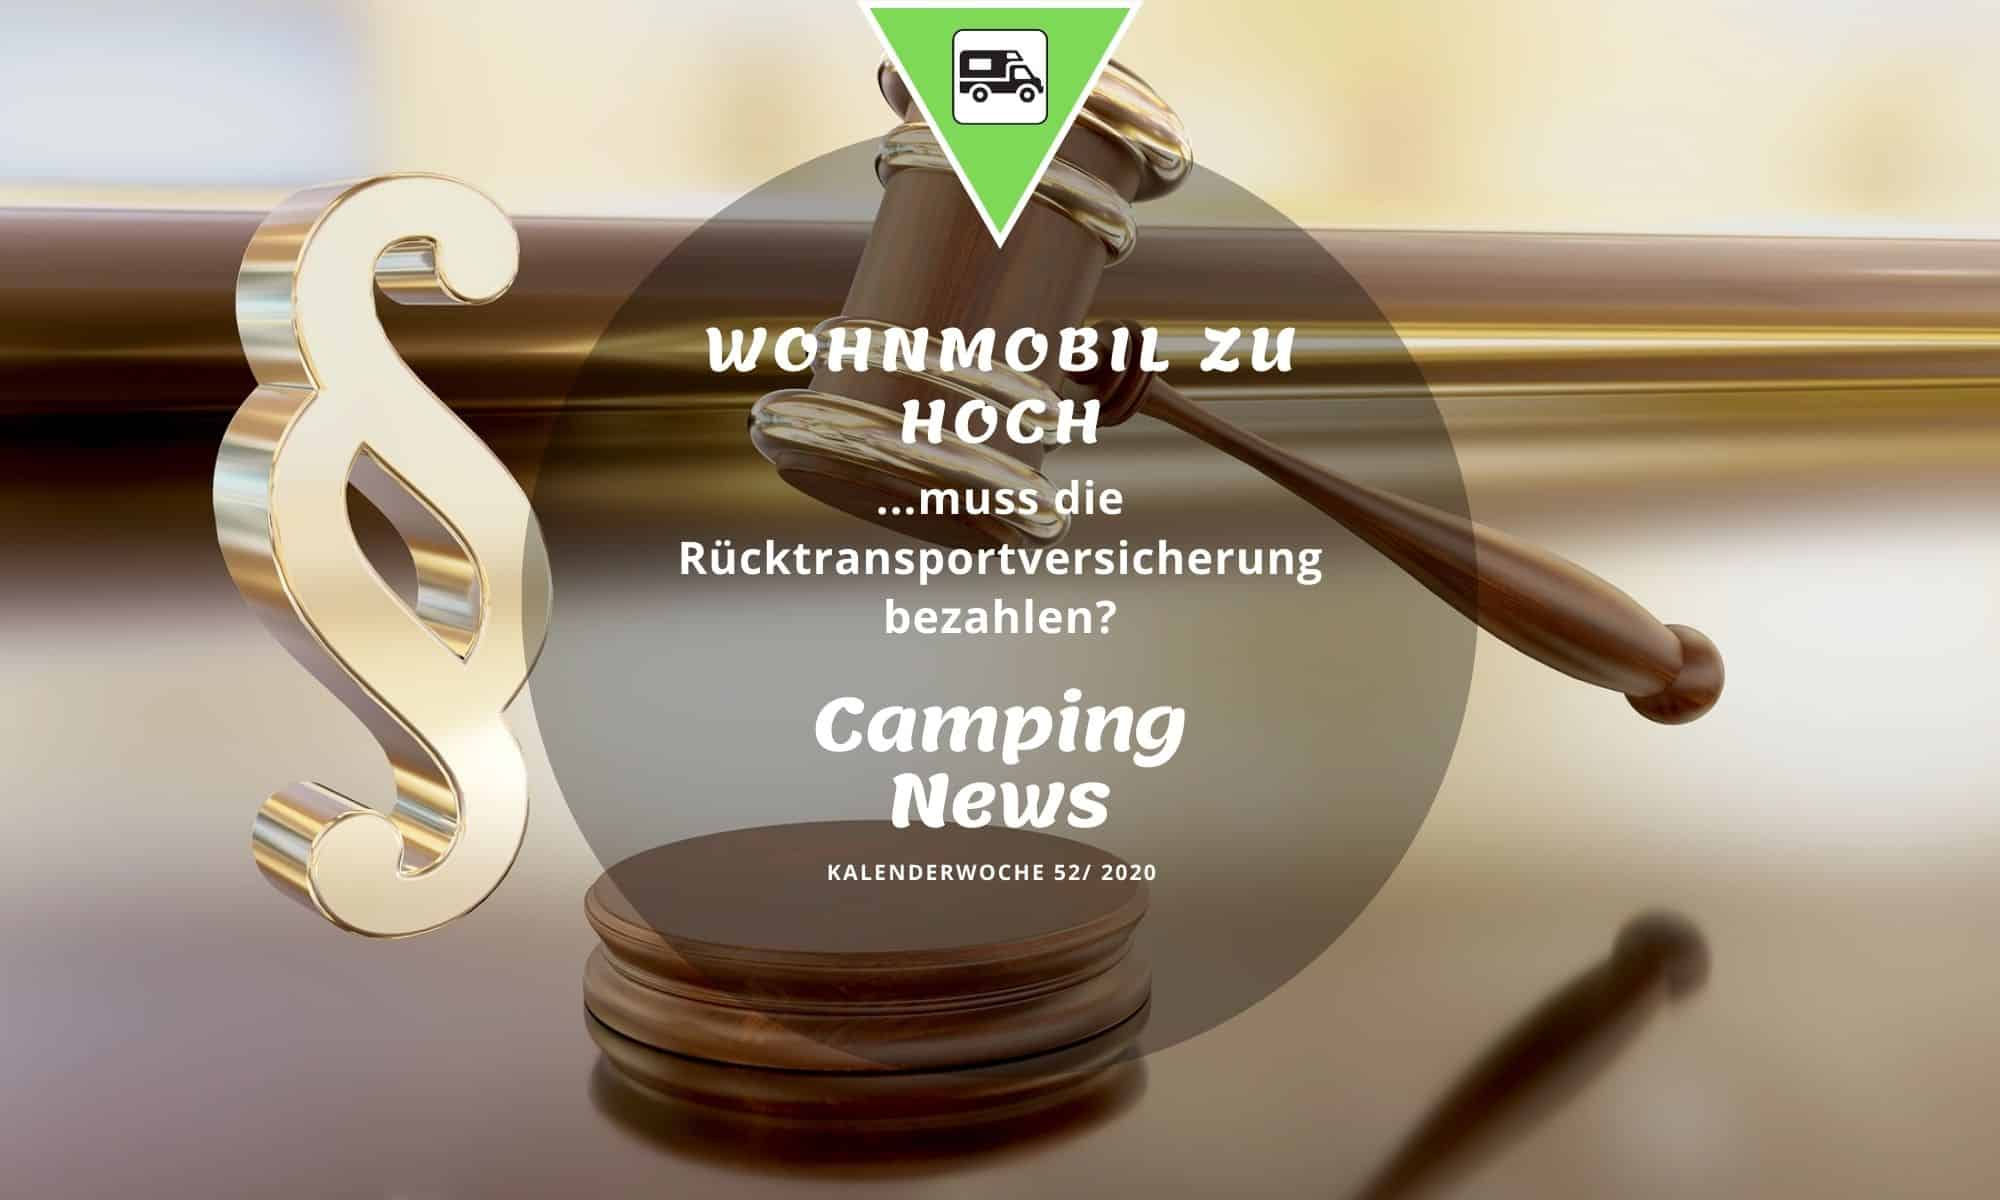 Wohnmobil zu hoch – muss die Rücktransportversicherung bezahlen? | Camping News Wochenrückblick – KW52/2020